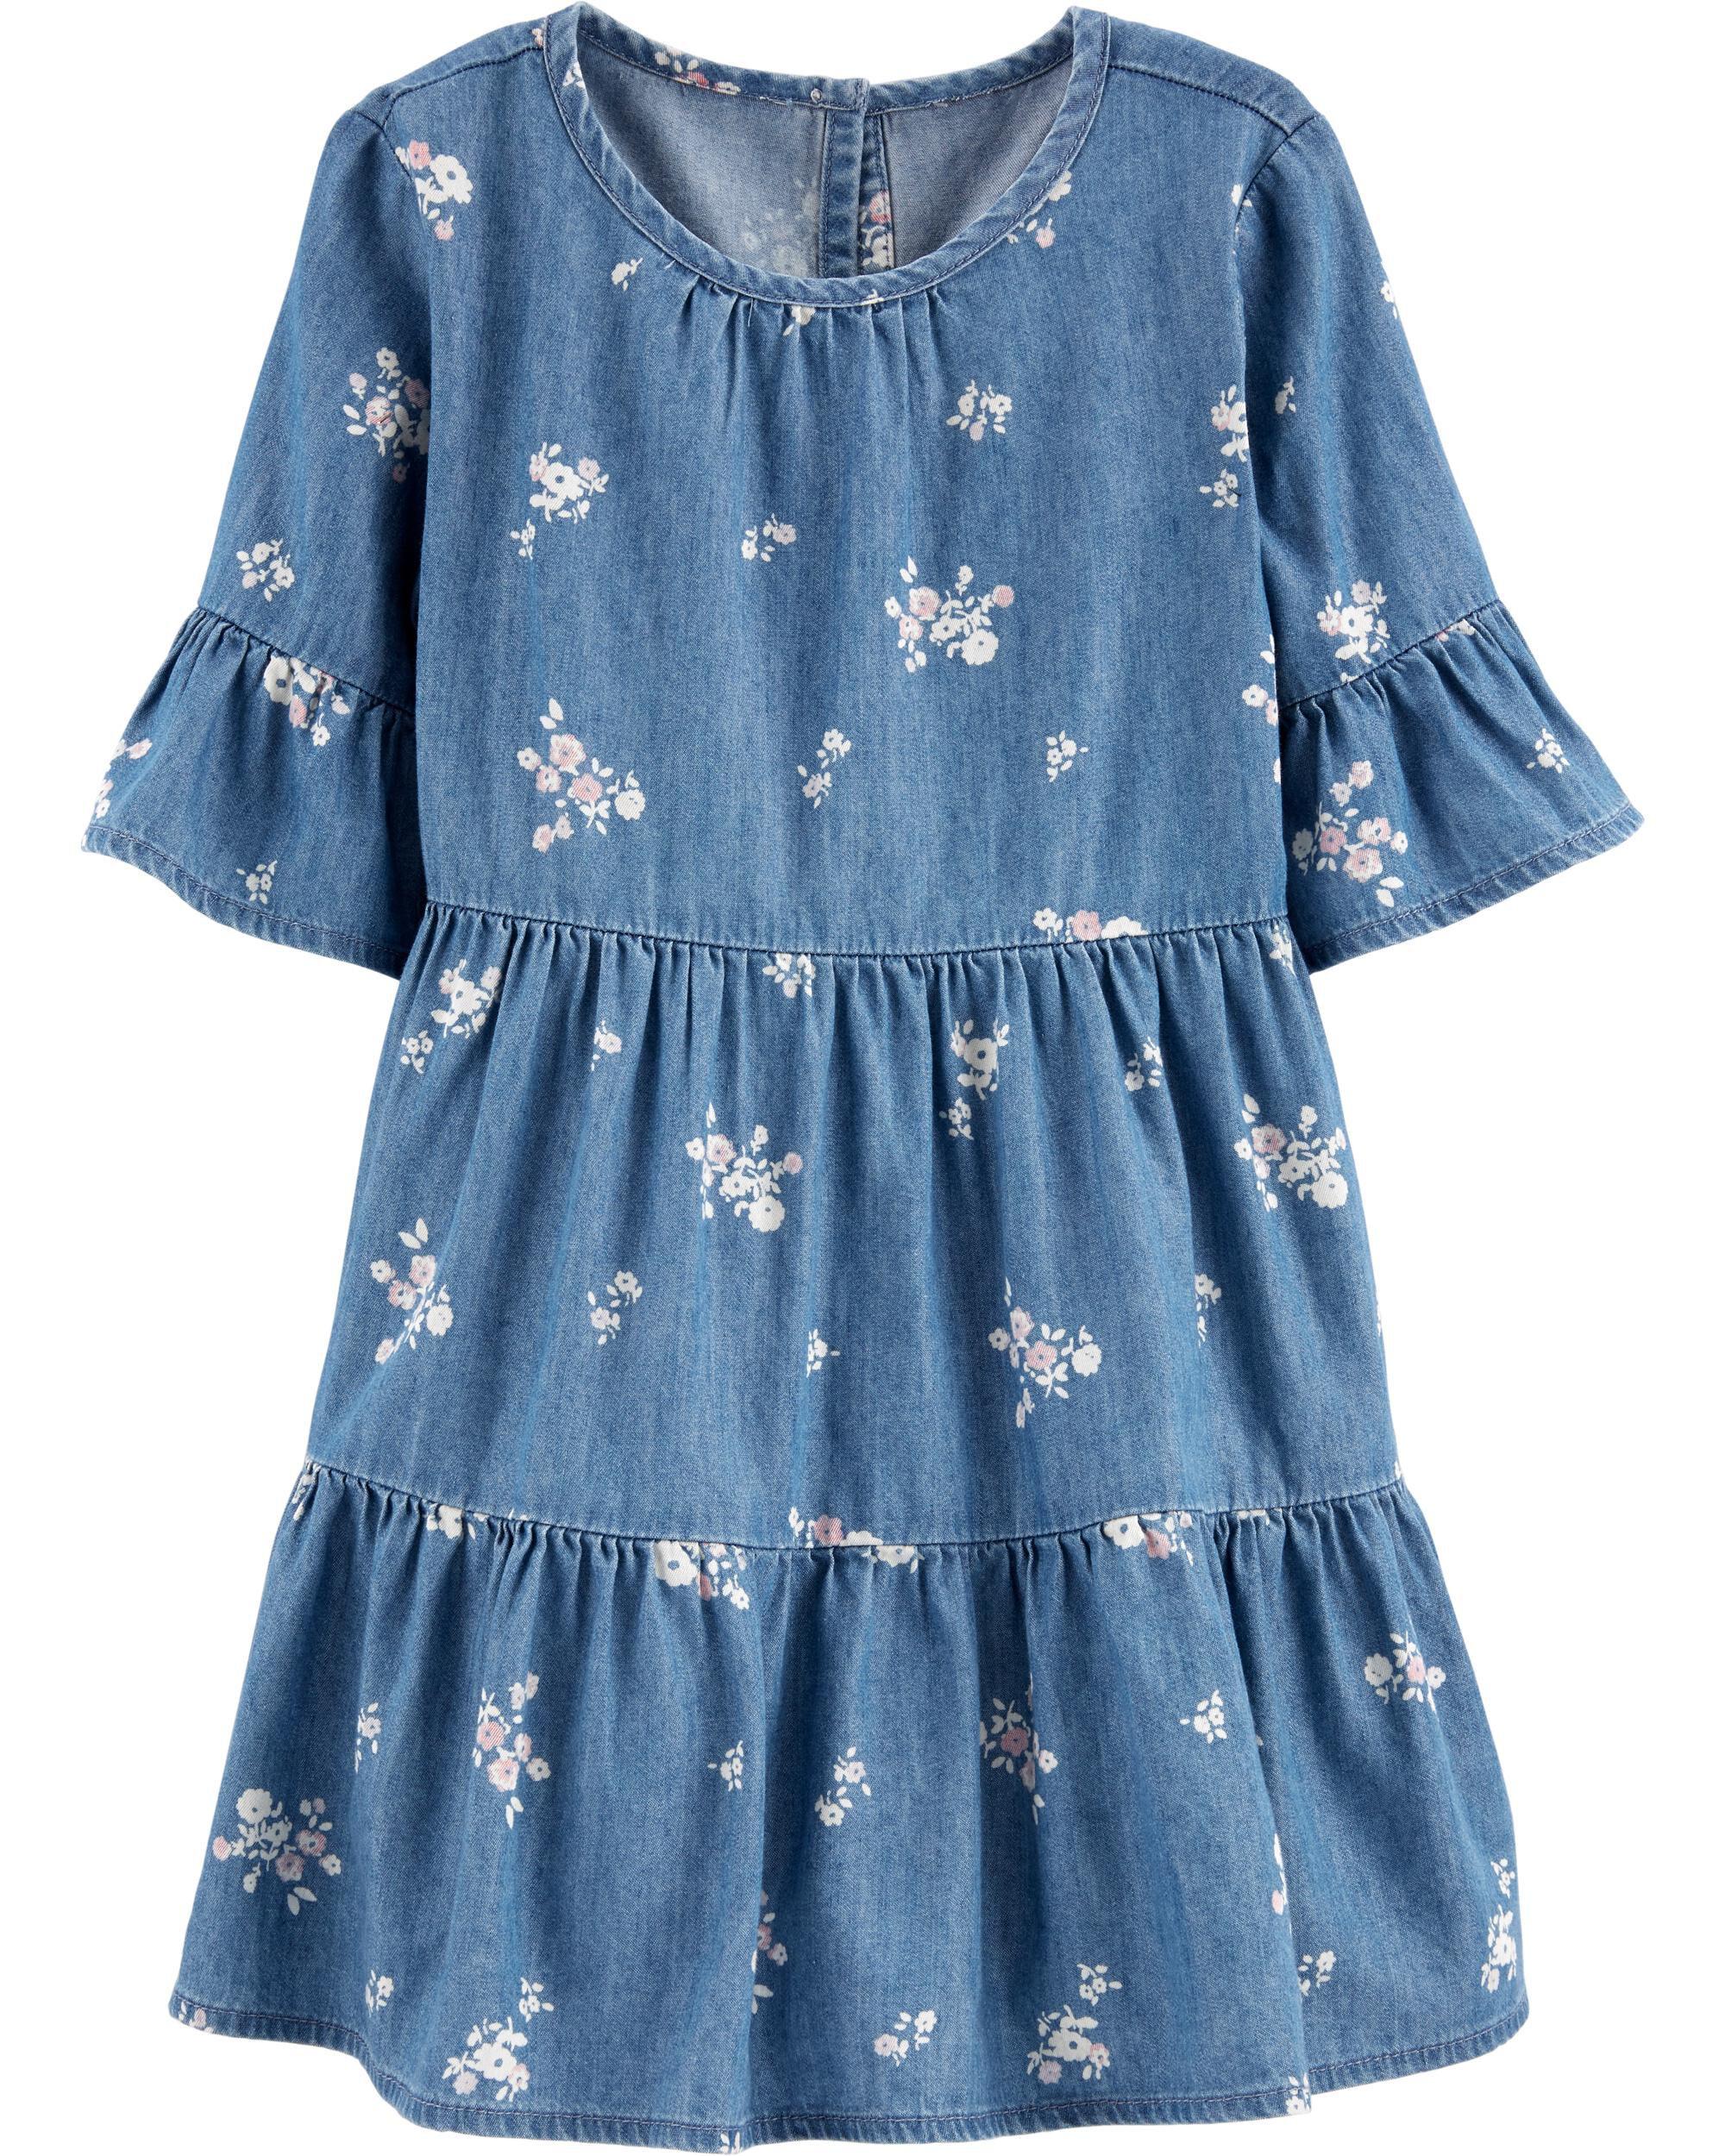 *CLEARANCE* Floral Denim Dress